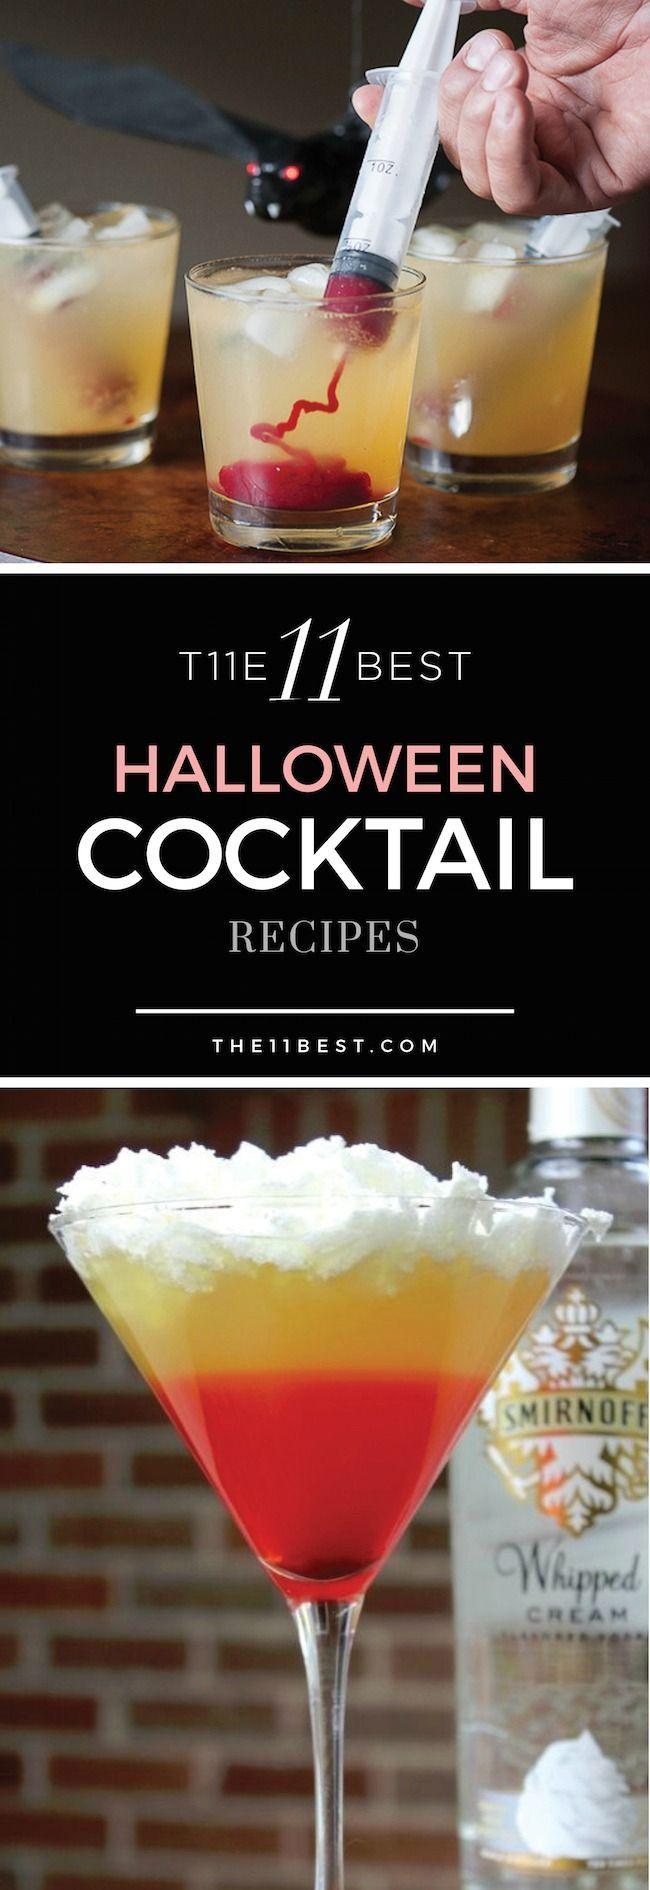 The 11 Best Halloween Cocktail Recipe Ideas - | Pinterest ...